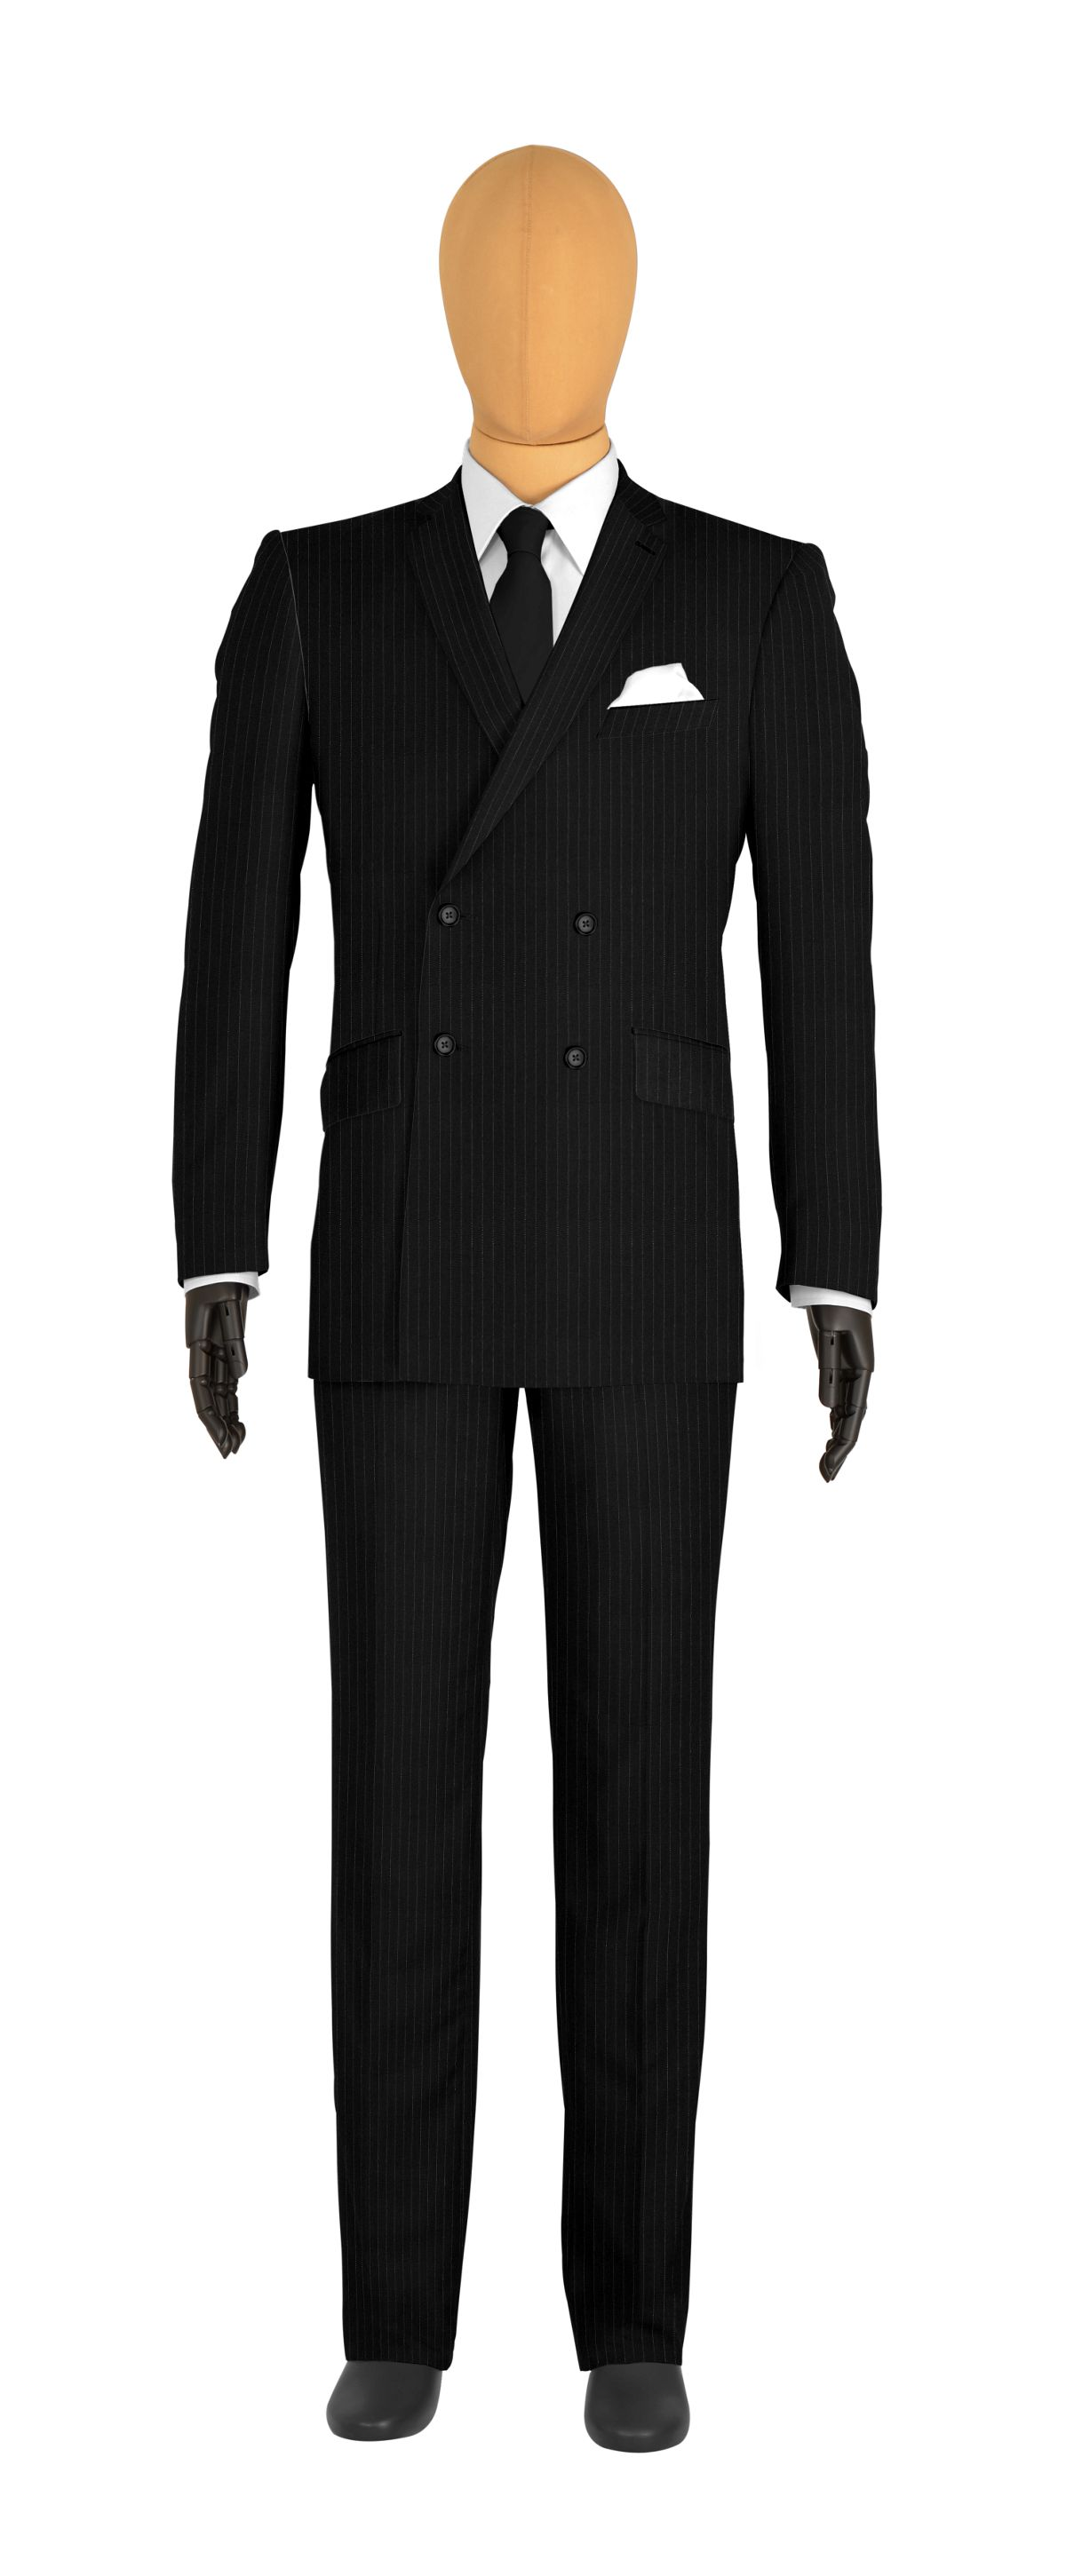 Costume veste croisée noir rayé